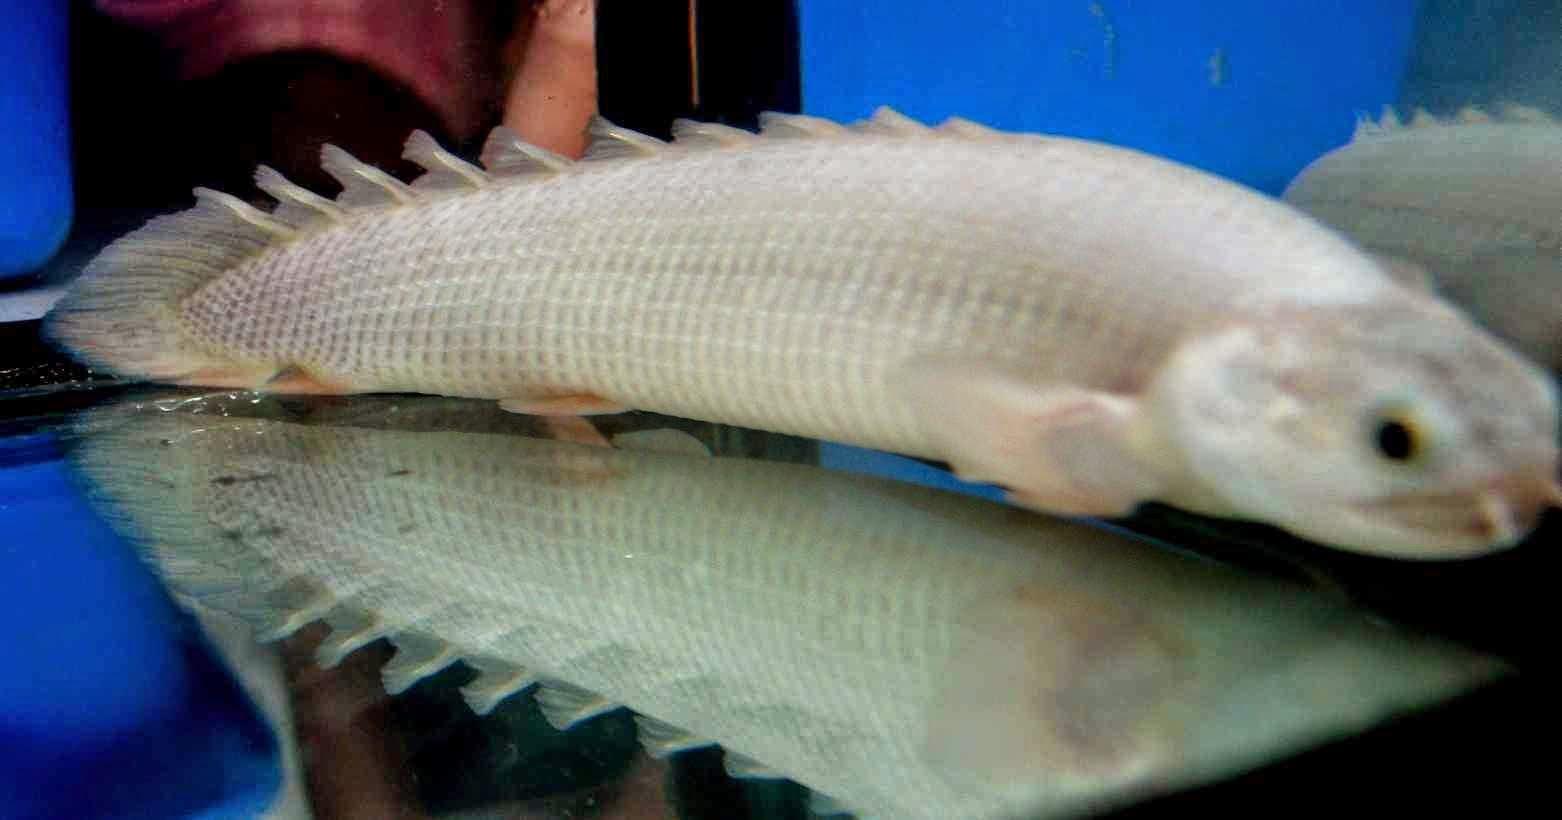 Pt griya artha kencana aquarium platinum fish exotic for Rare aquarium fish